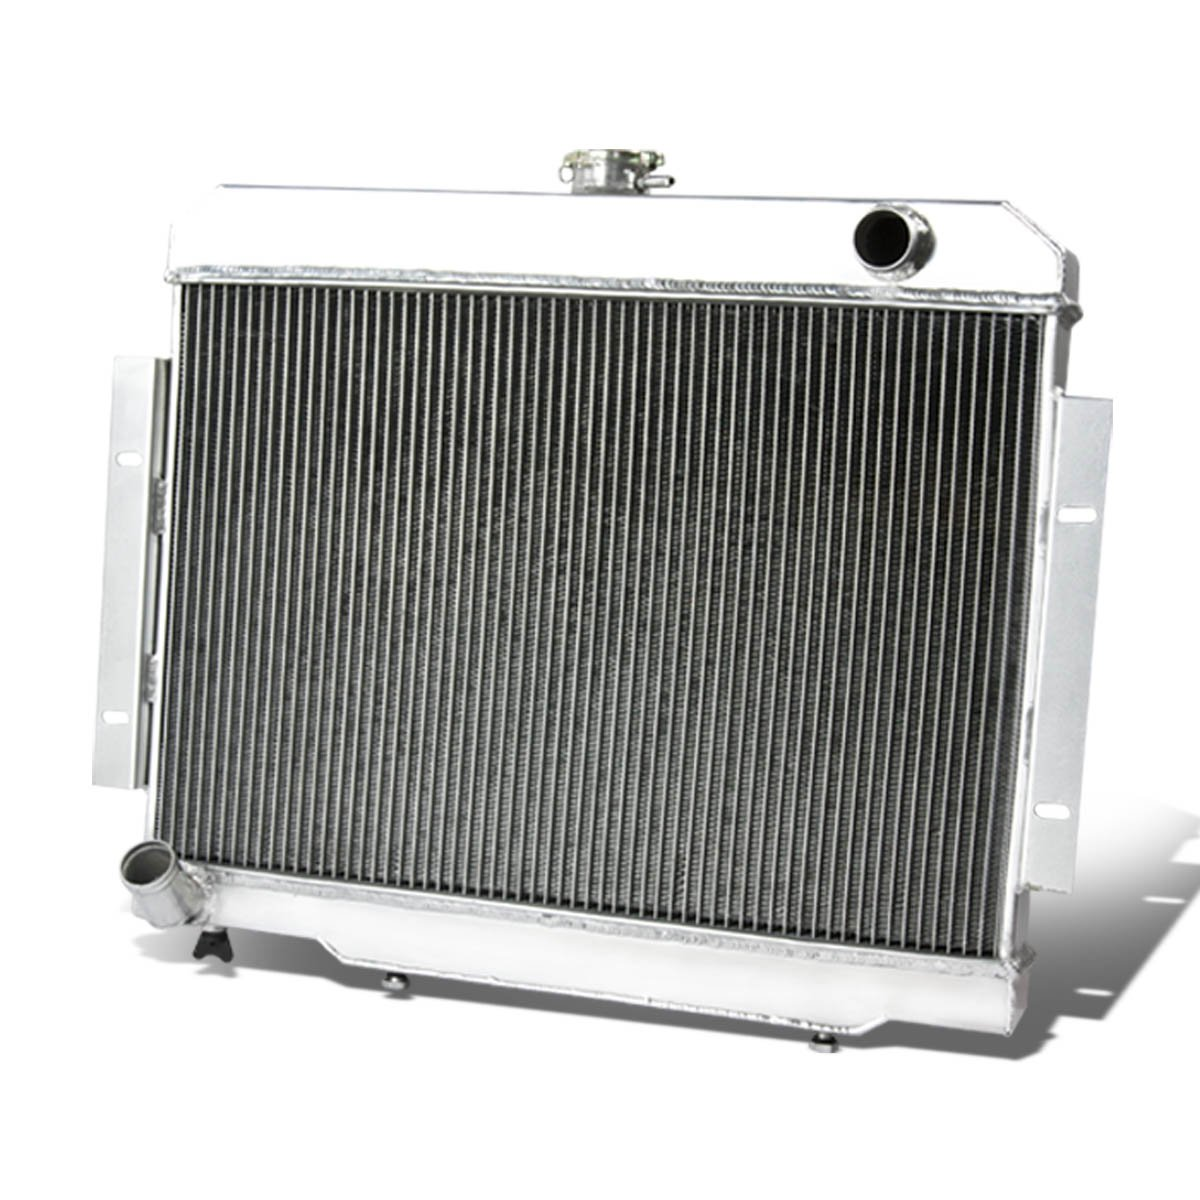 Jeep CJ 3-Row Full Aluminum Racing Radiator (Manual Transmission Only)